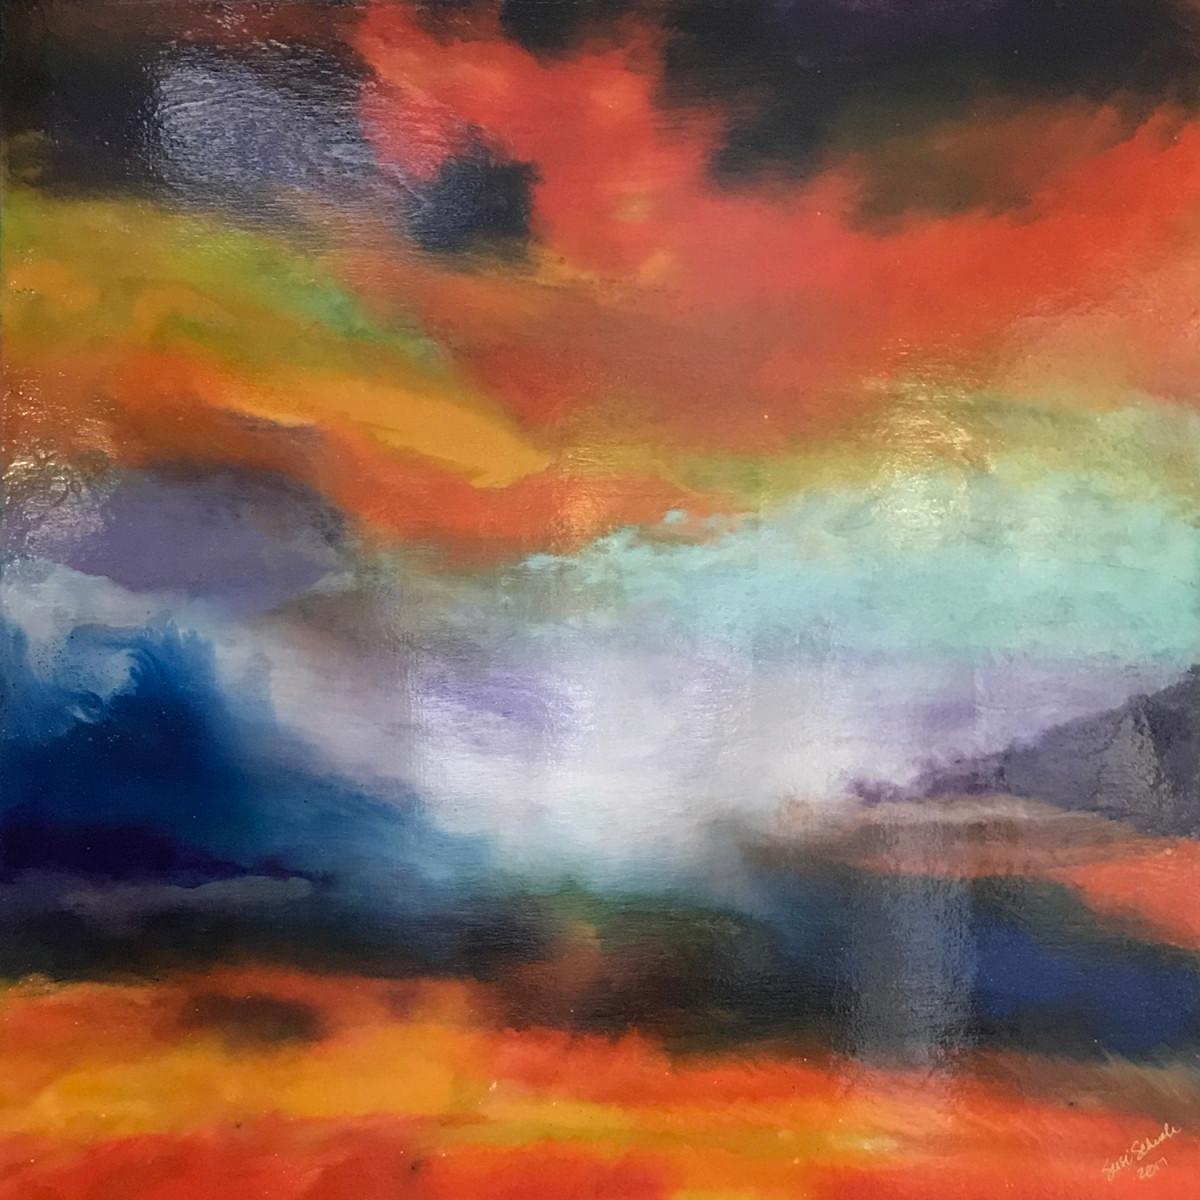 Lights by Susi Schuele